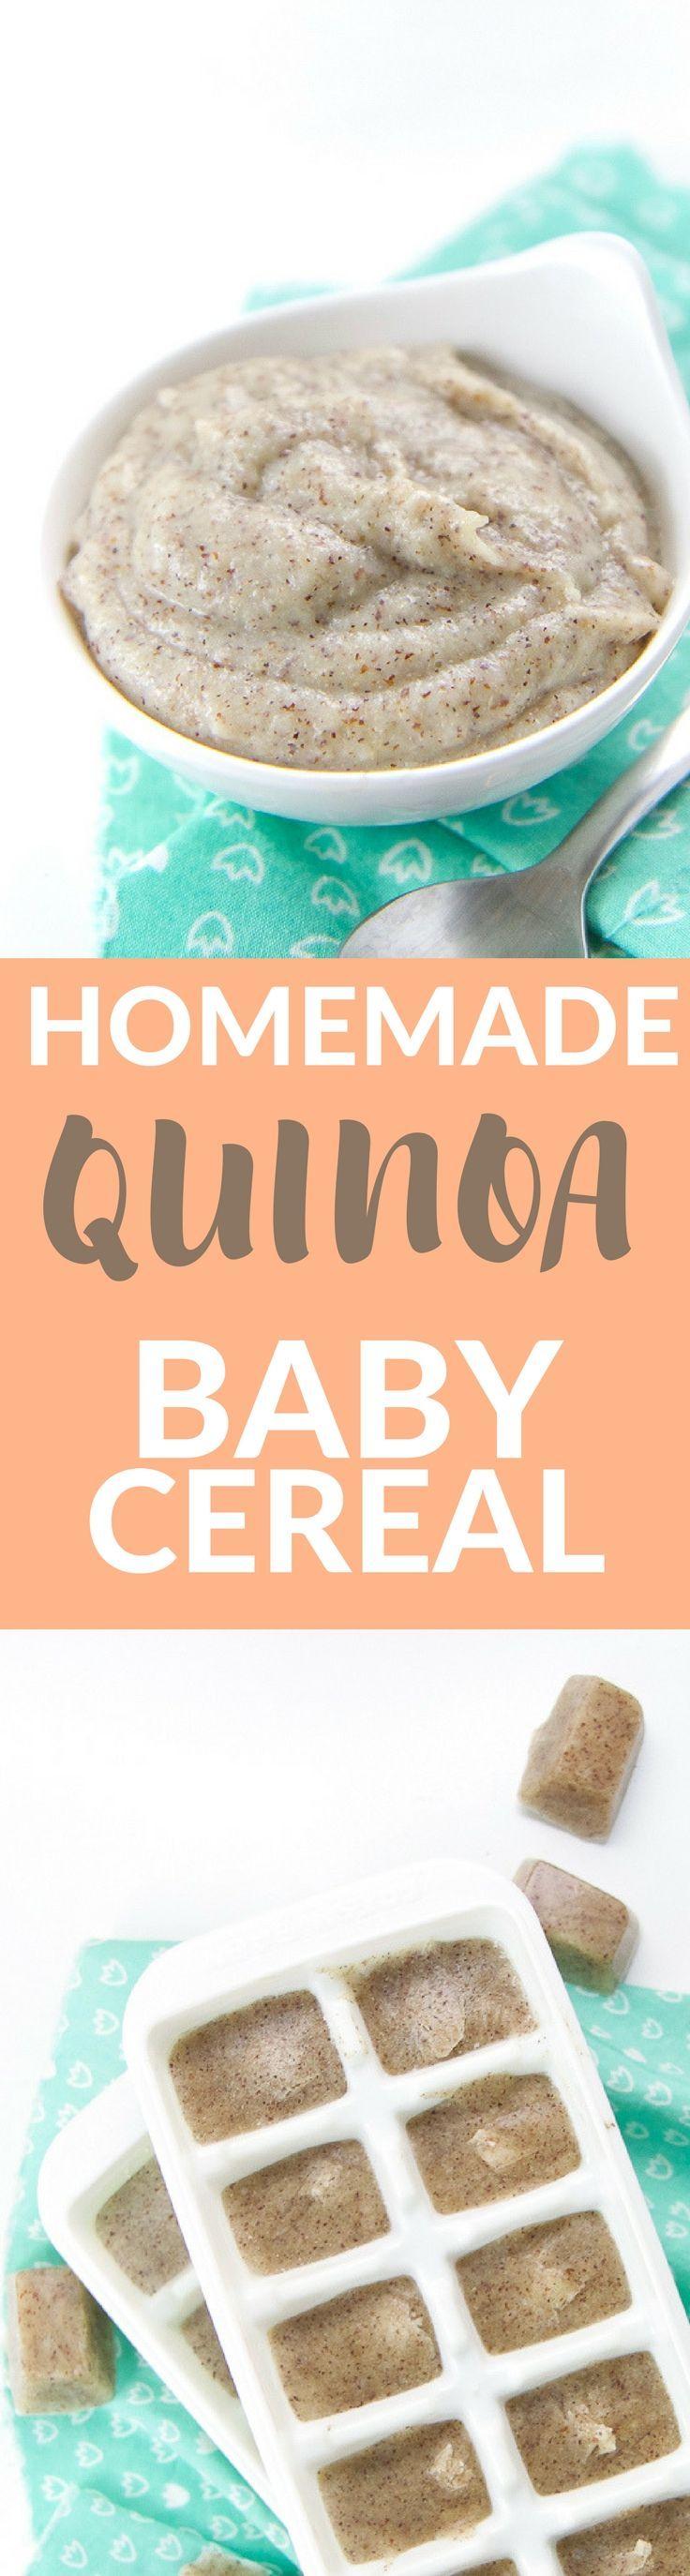 Homemade Quinoa Baby Cereal Recipe